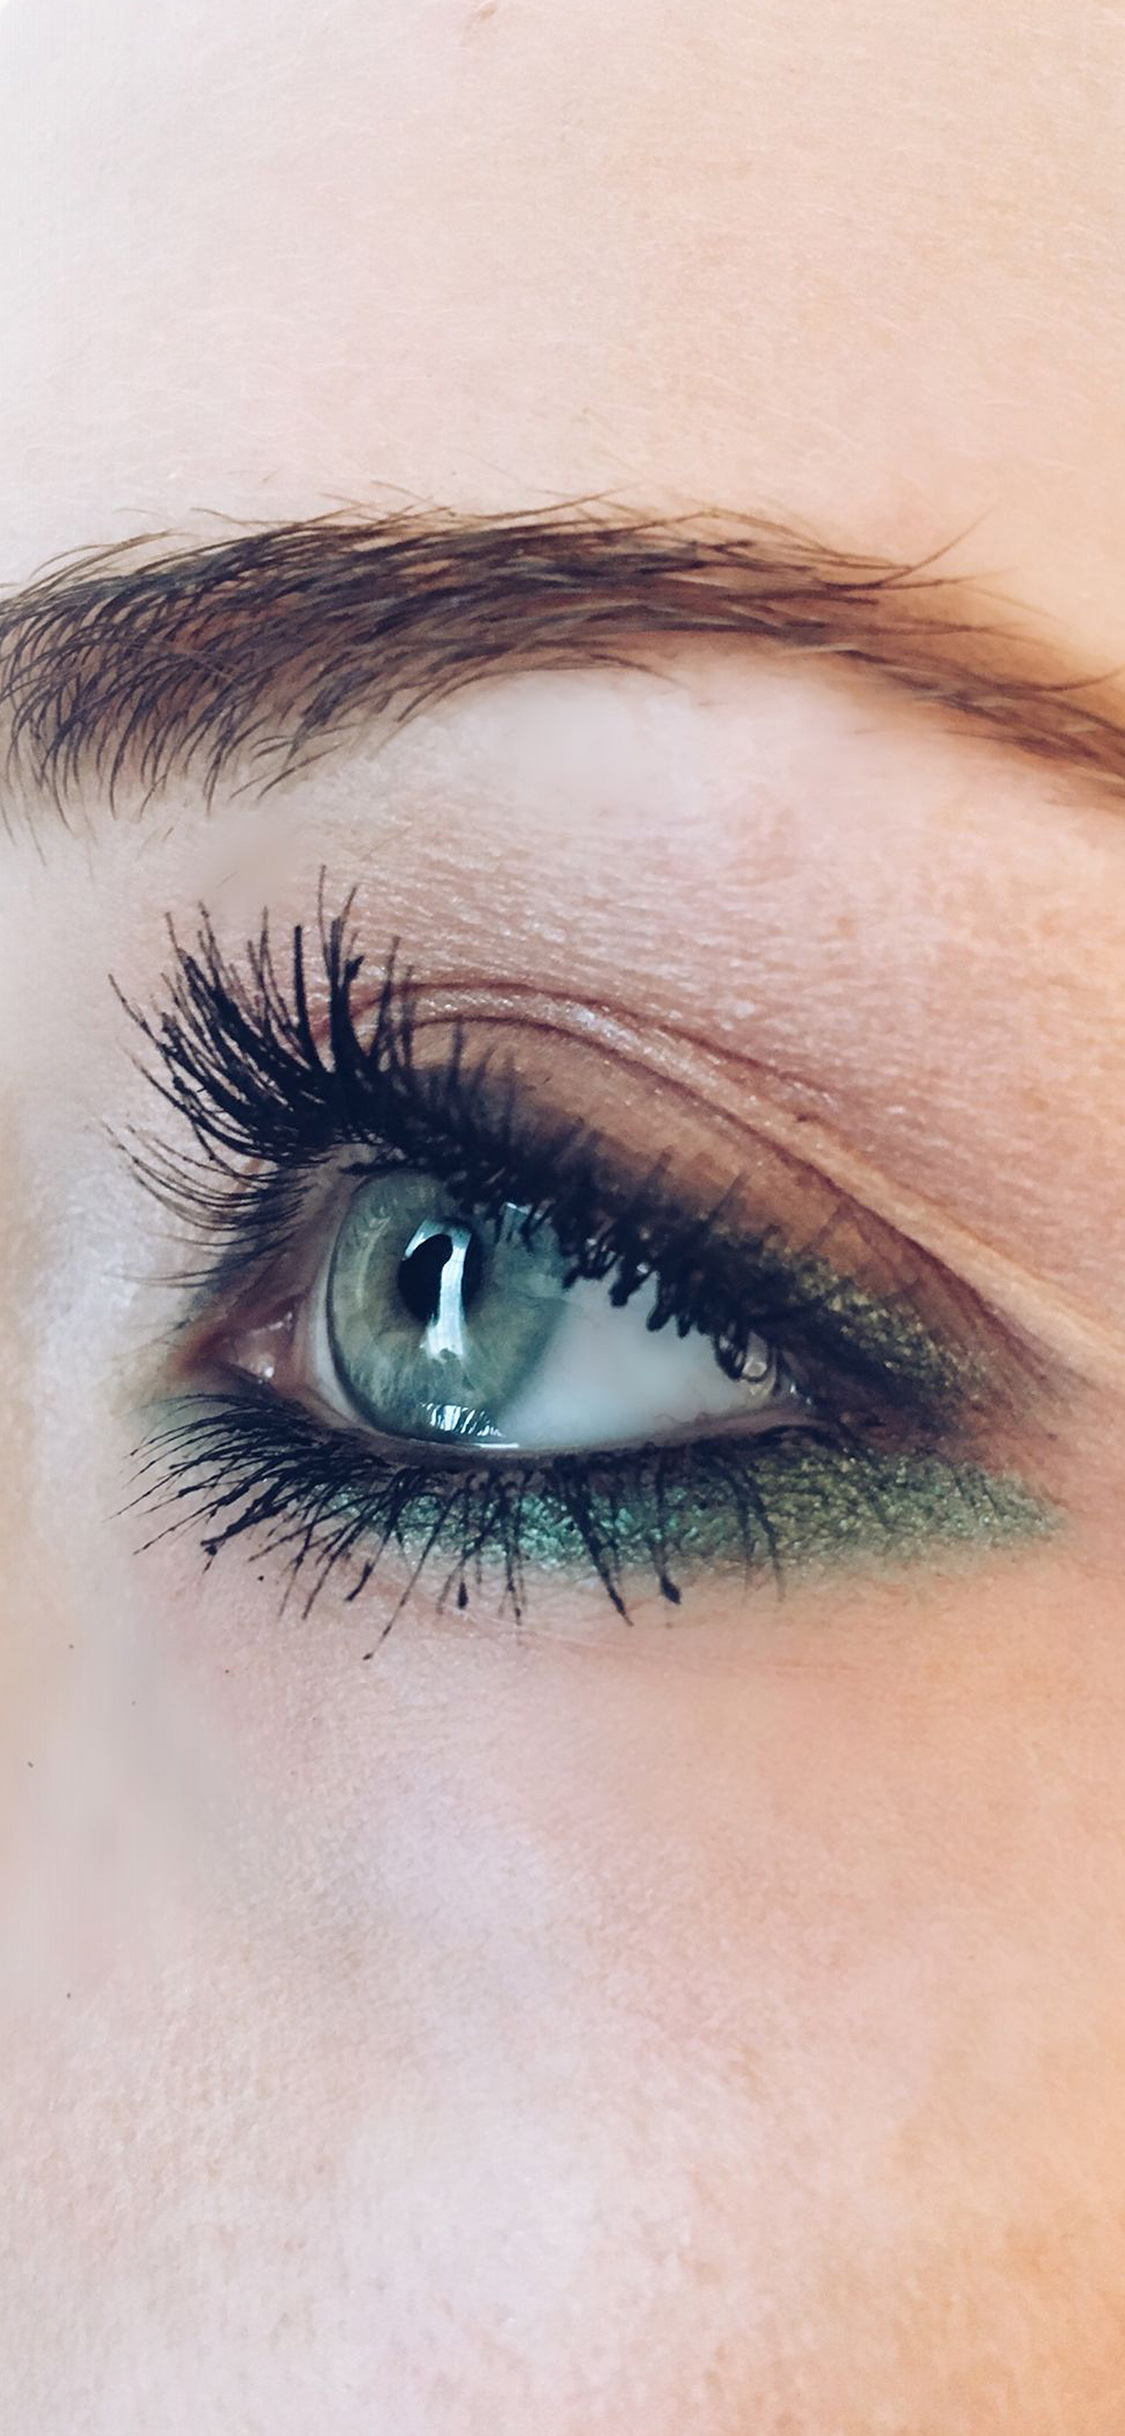 iPhoneXpapers.com-Apple-iPhone-wallpaper-hj55-eye-closeup-blue-makeup-beauty